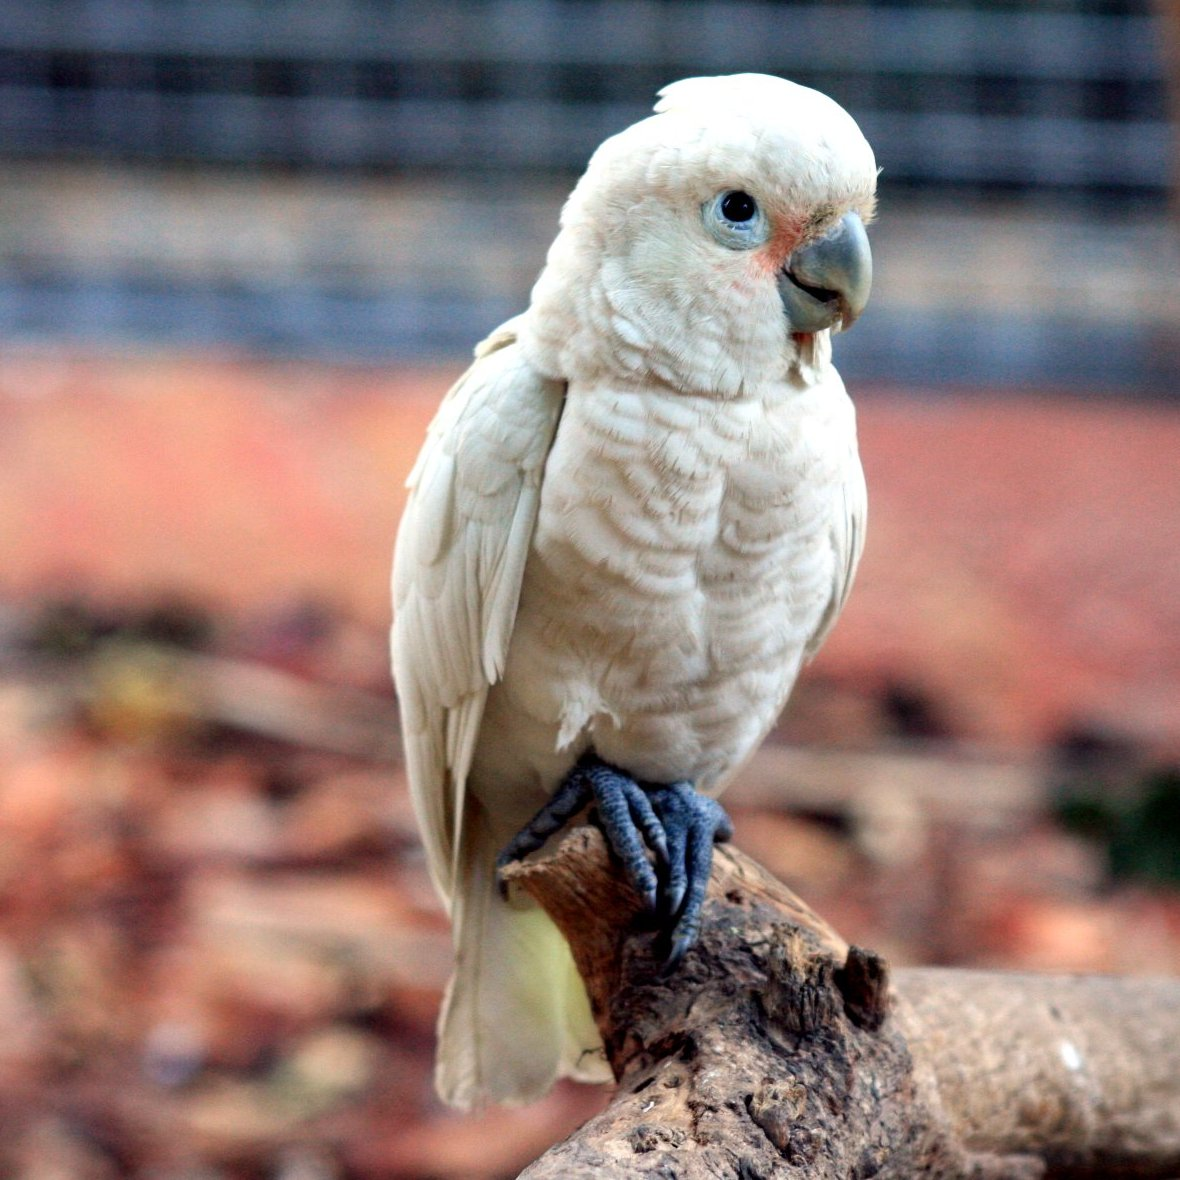 Mineola pet shop seeks return of stolen 'exotic' bird